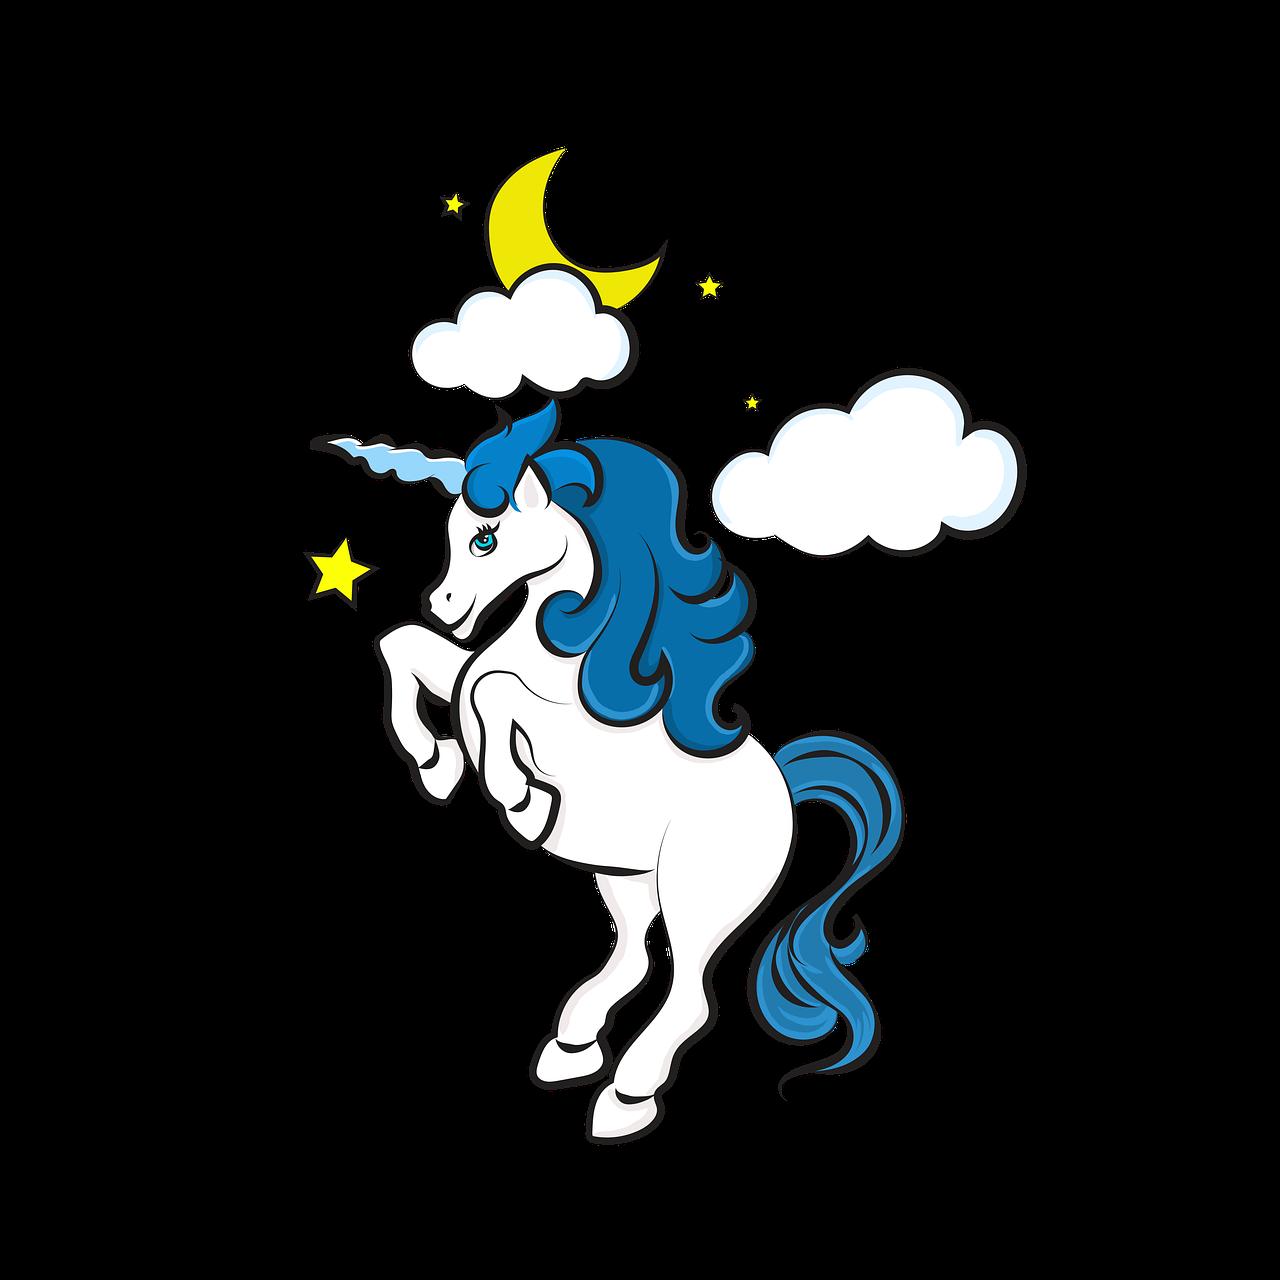 Unicorn Drawing Cute Free Image On Pixabay